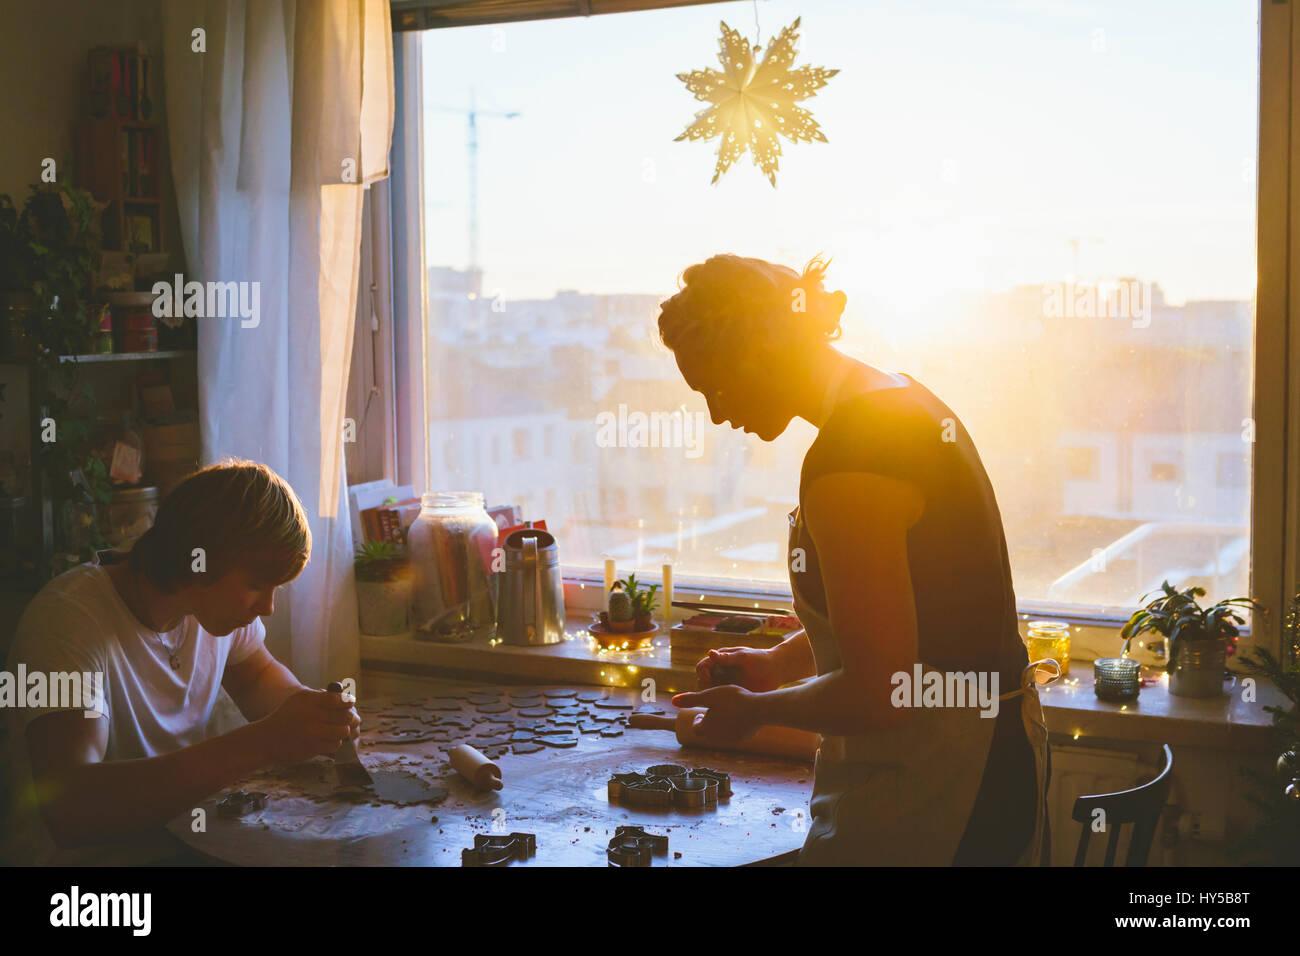 Finnland, Helsinki, paar Vorbereitung Weihnachtsplätzchen Stockbild